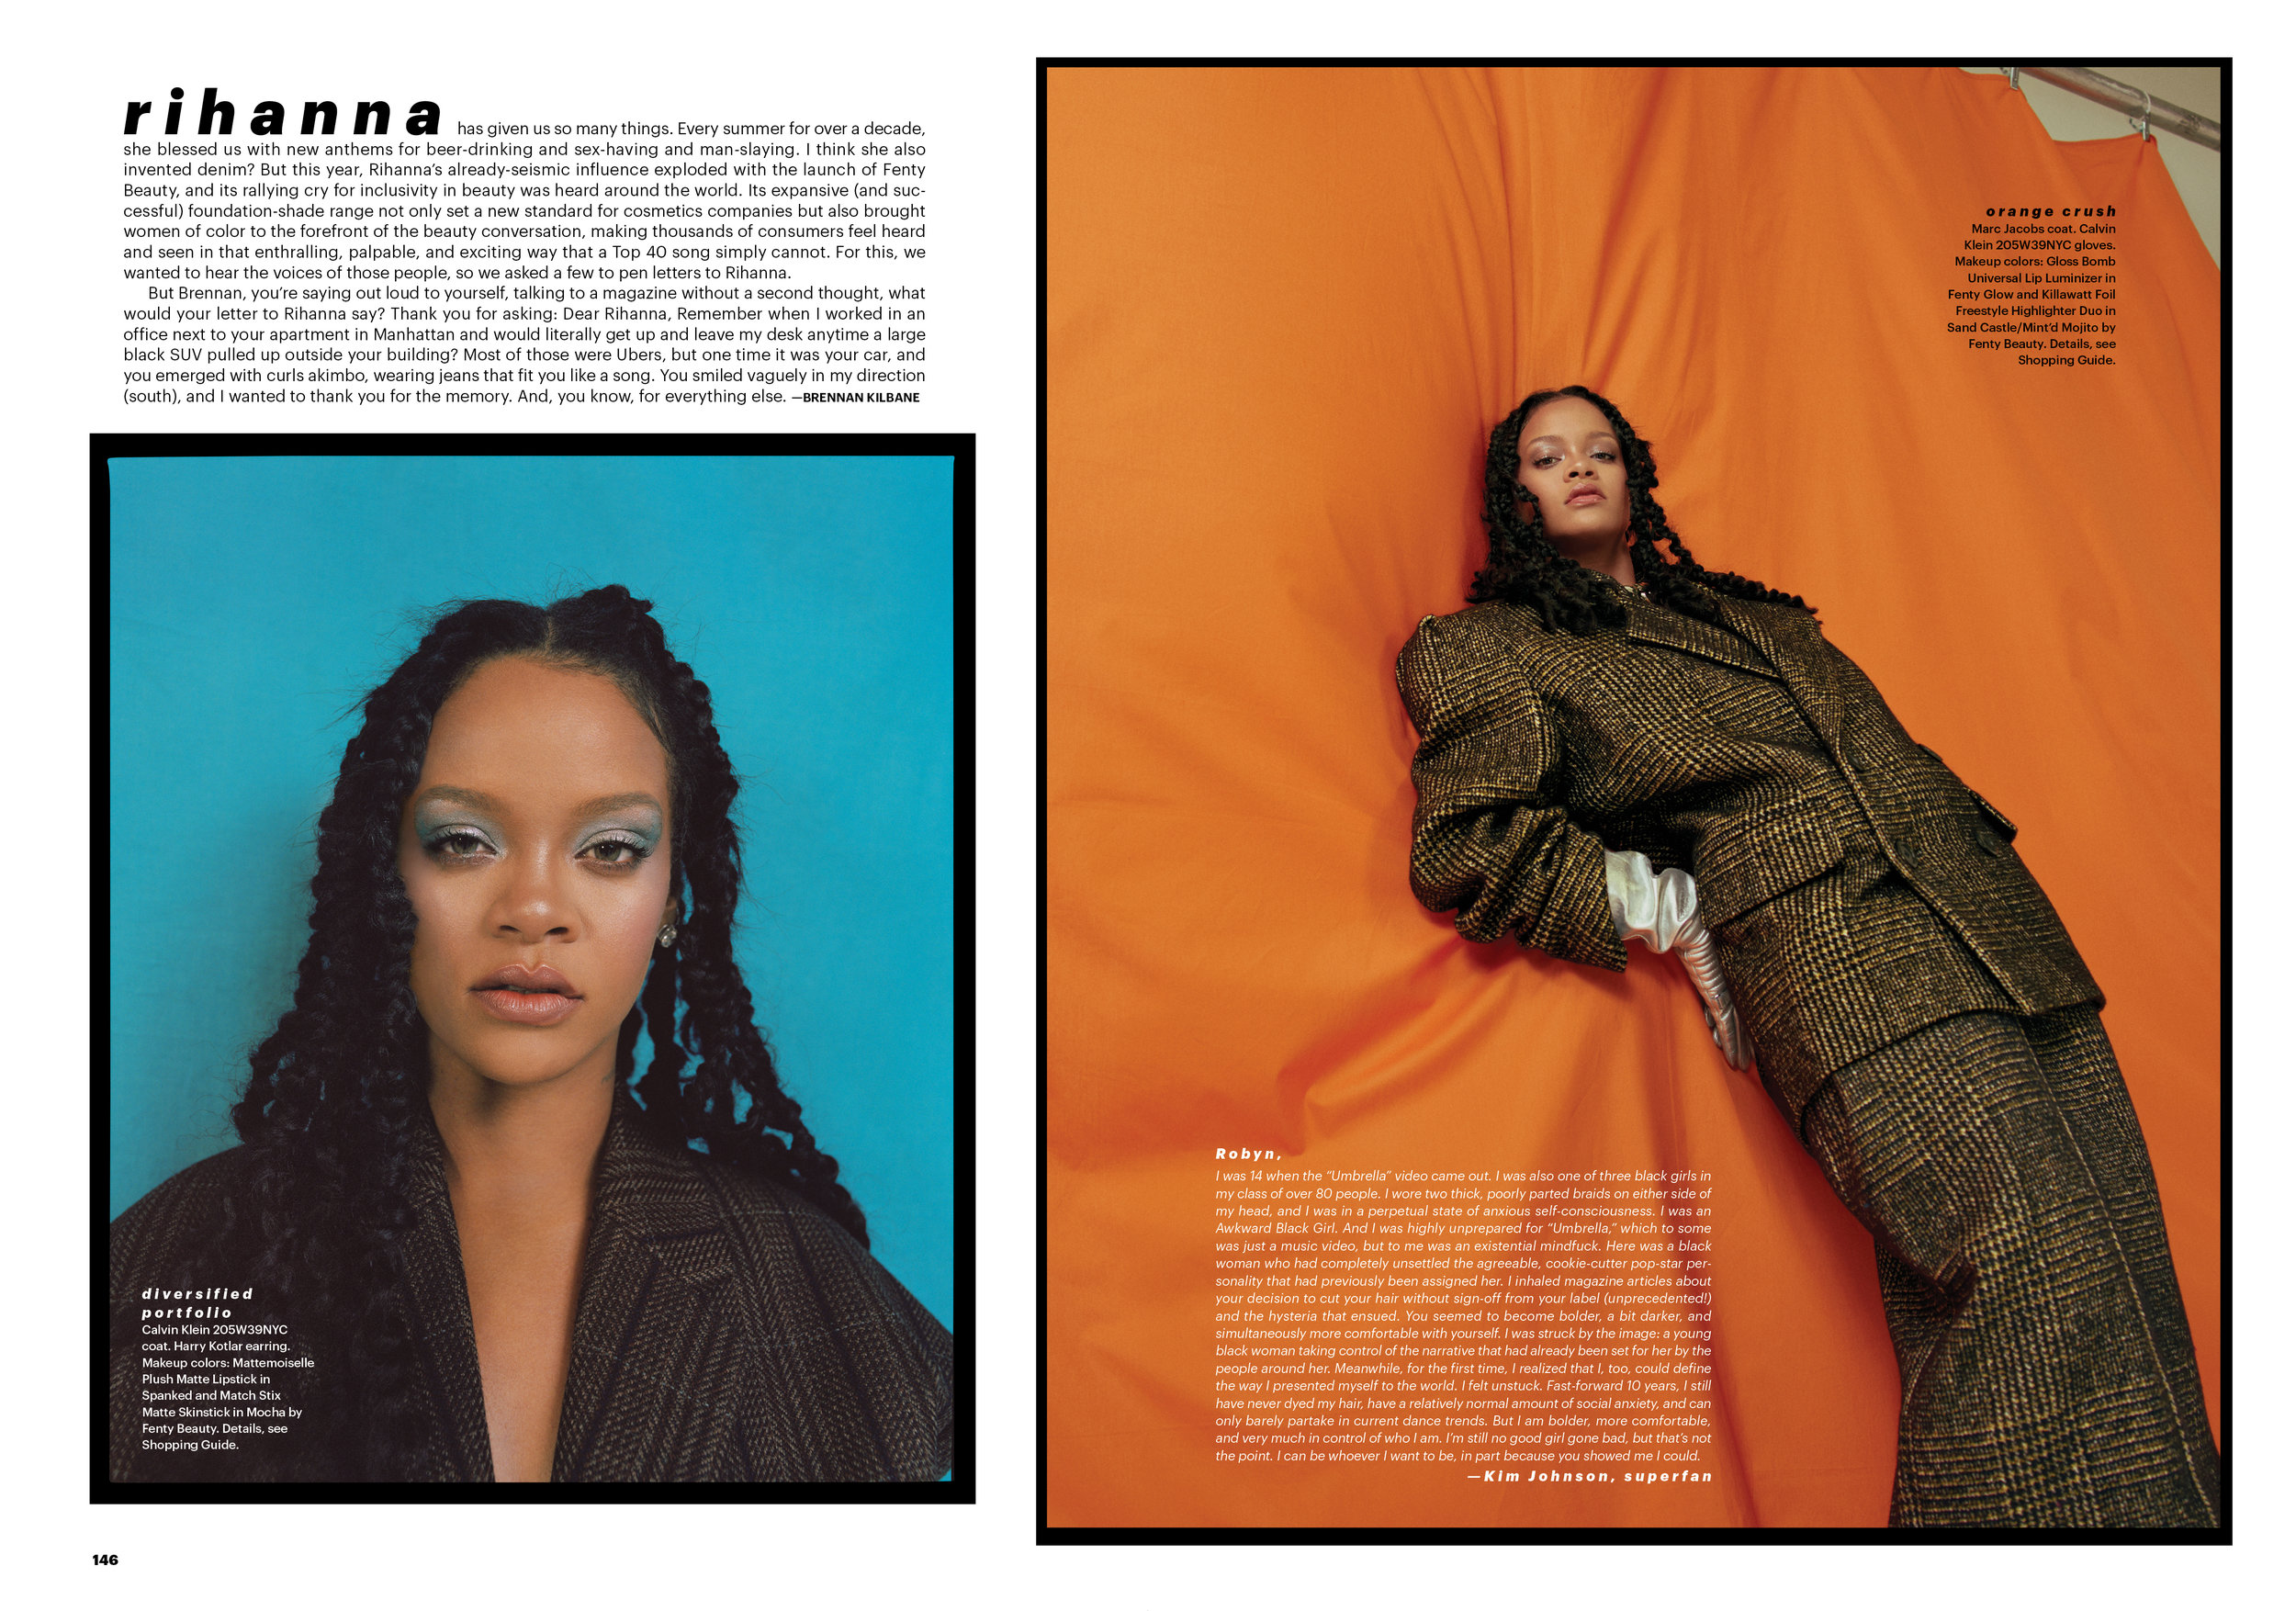 AL100118Profile_Rihanna_lo_20274428;59_View2.jpg